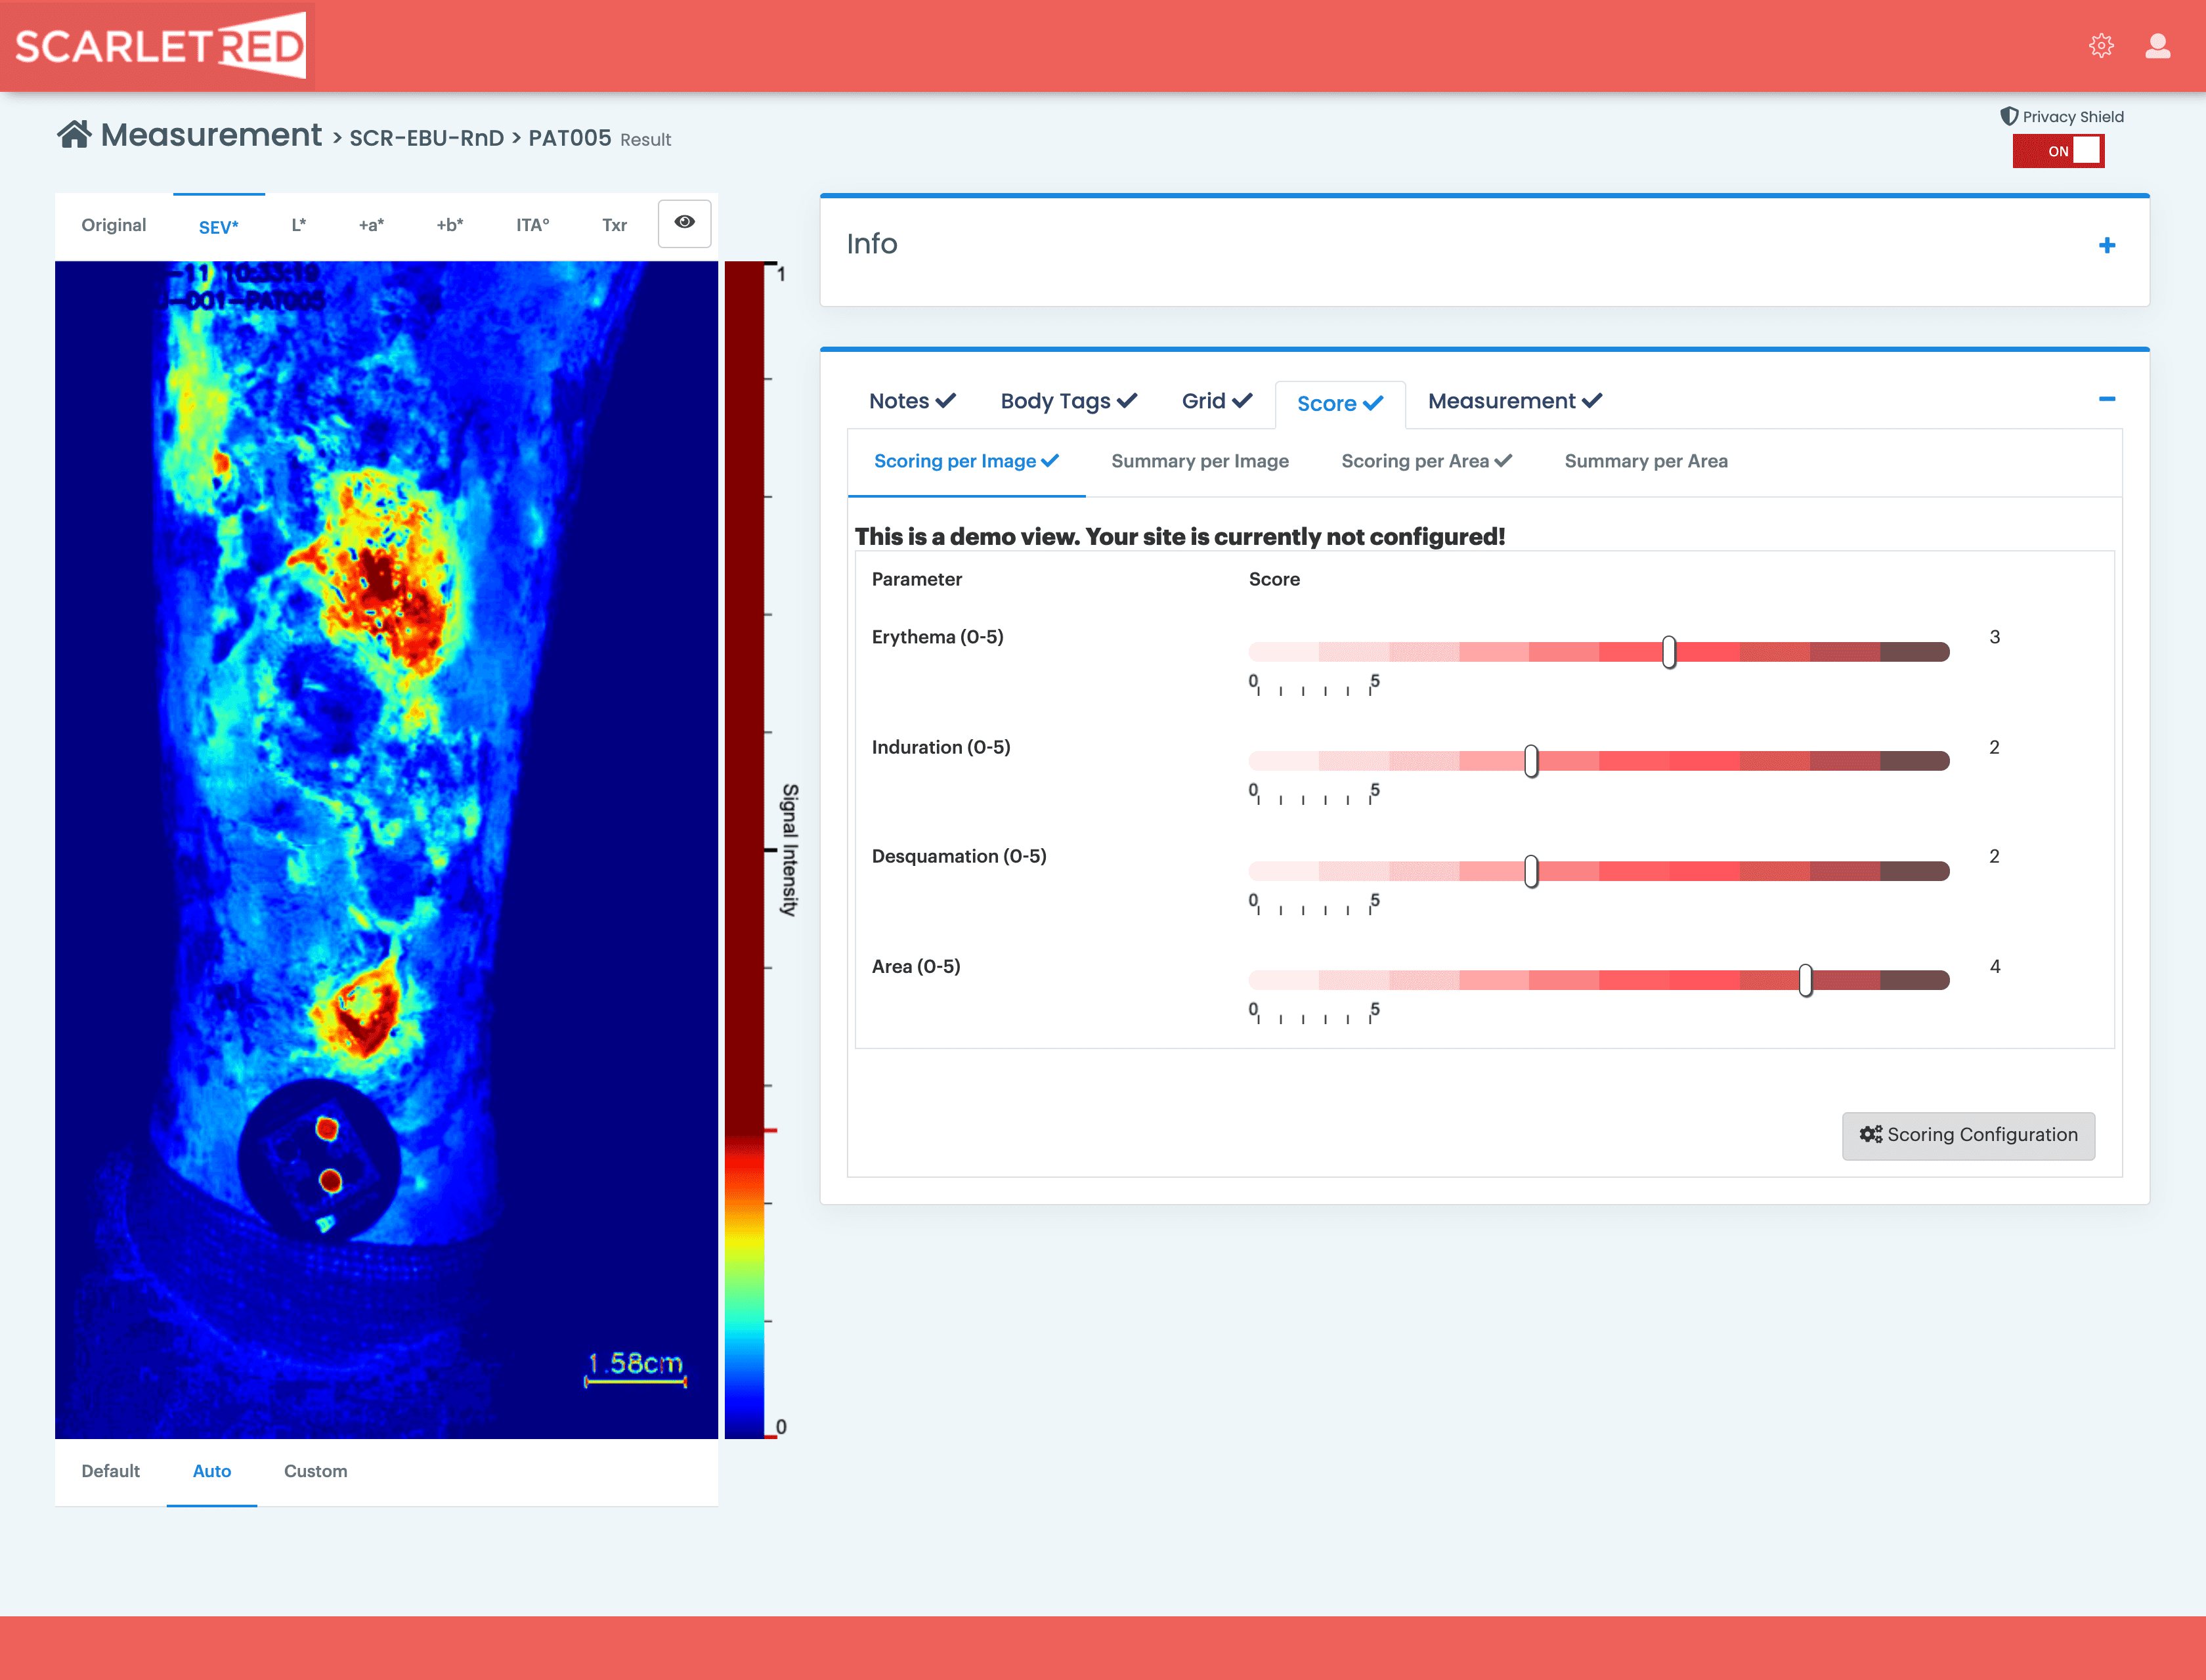 Epidermolysis bullosa SEV image  and scoring on ScarletredVision platform